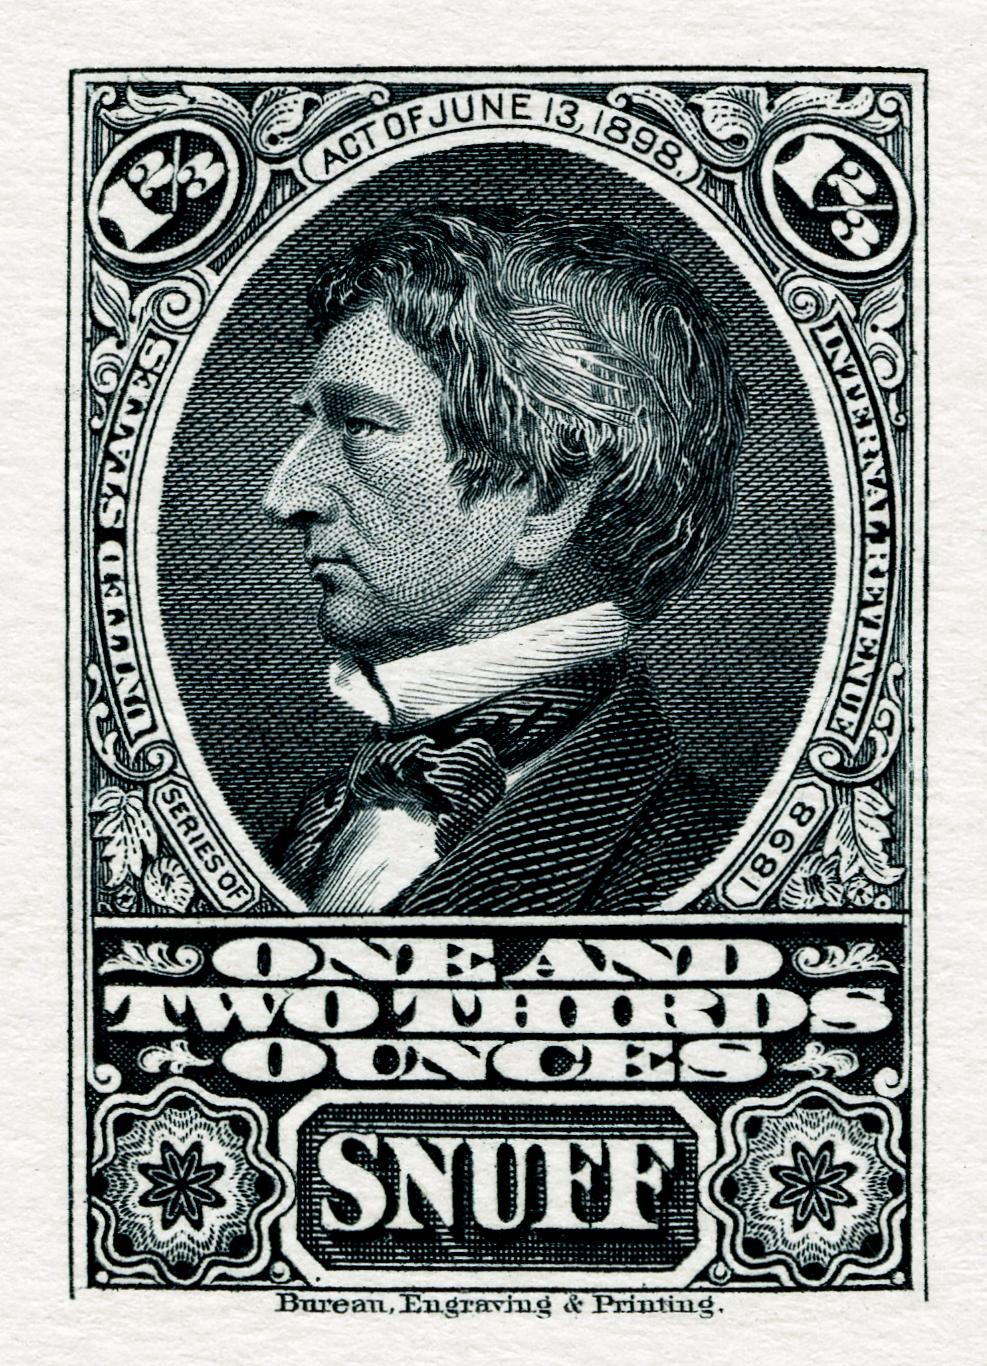 FileUS Stamp Internal Revenue 1898 Snuff 166 Oz Proof